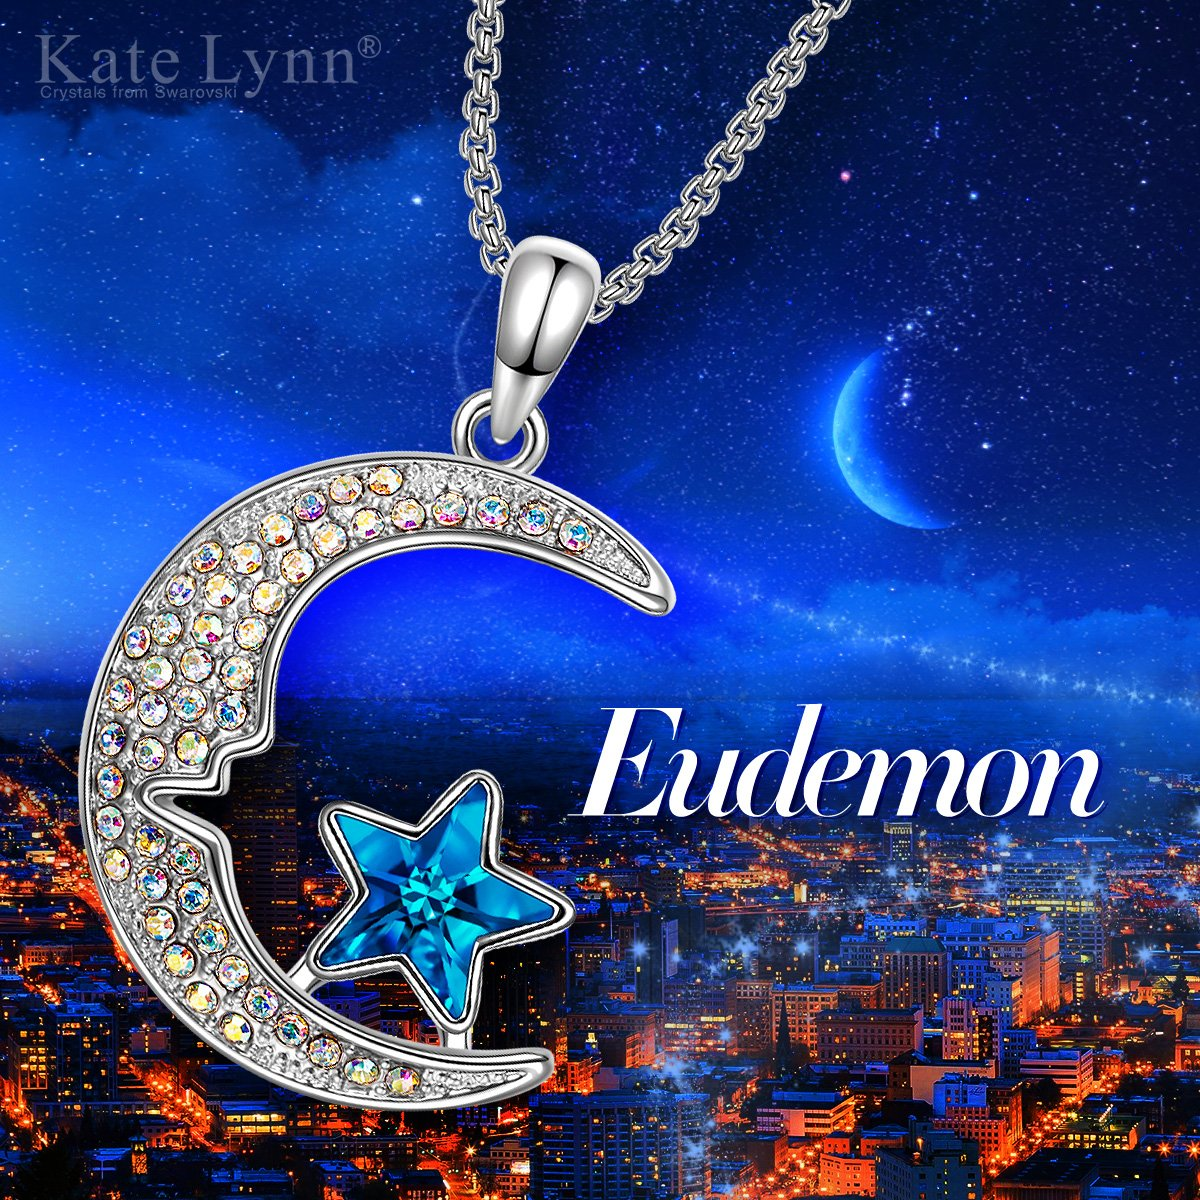 M/étal Cuivre Bleu Mer Collier Cristal de Swarovski Kate Lynn Eudemon